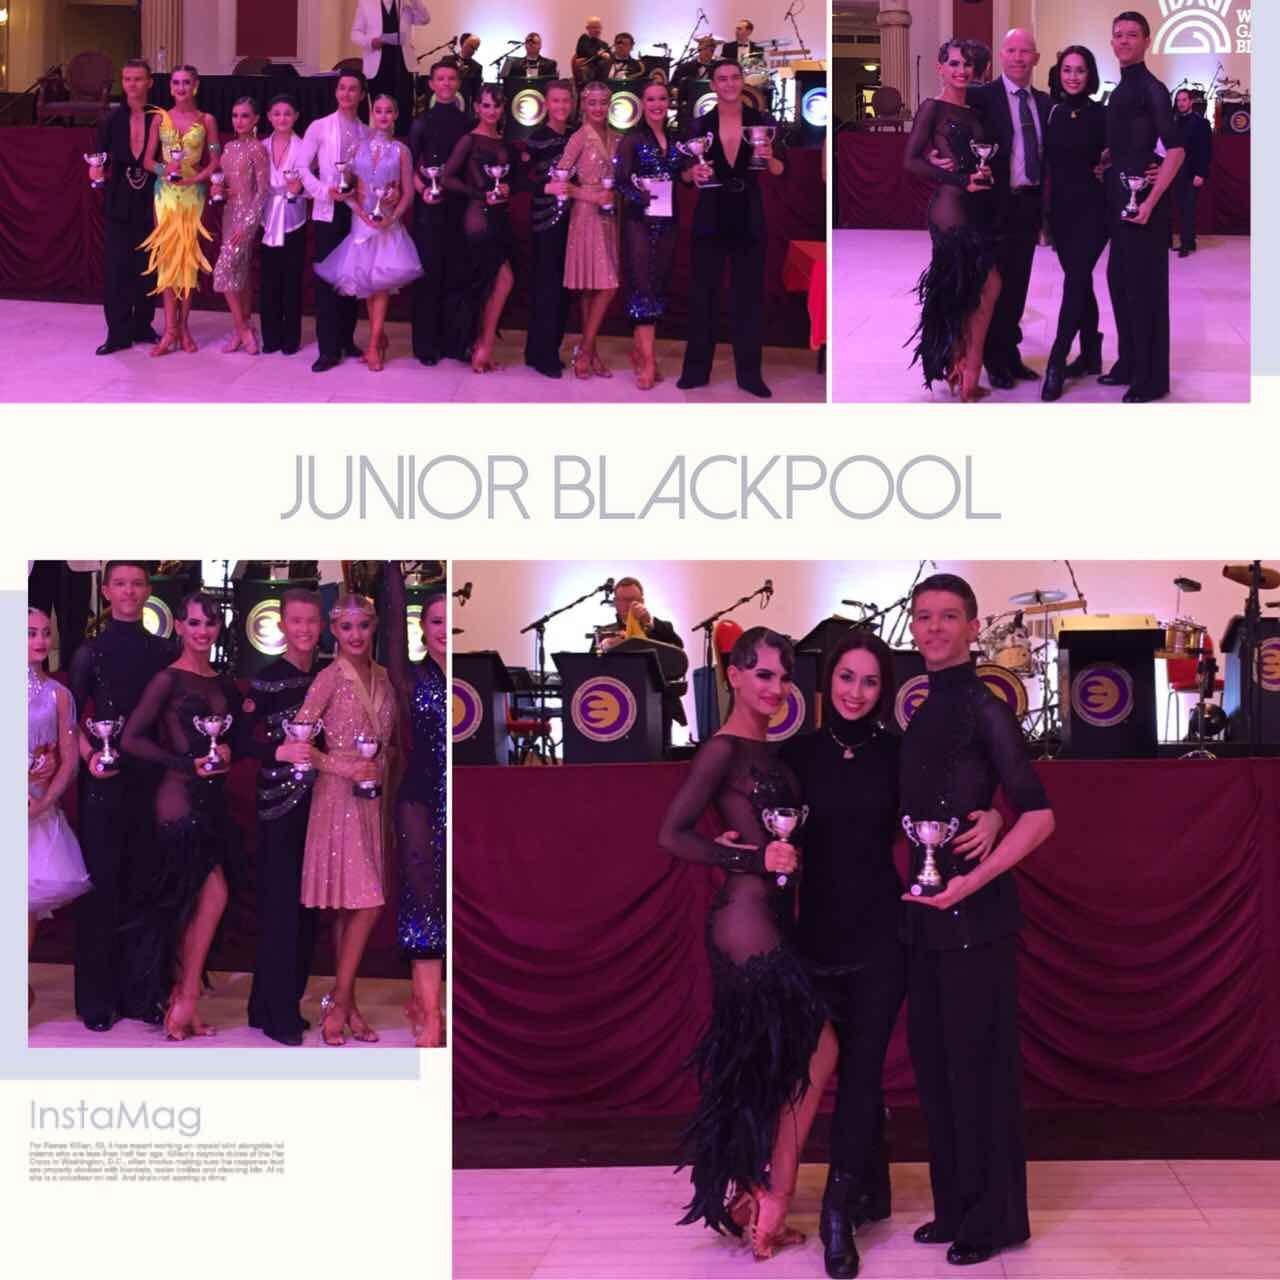 blackpool dance festival aboutdance com ua